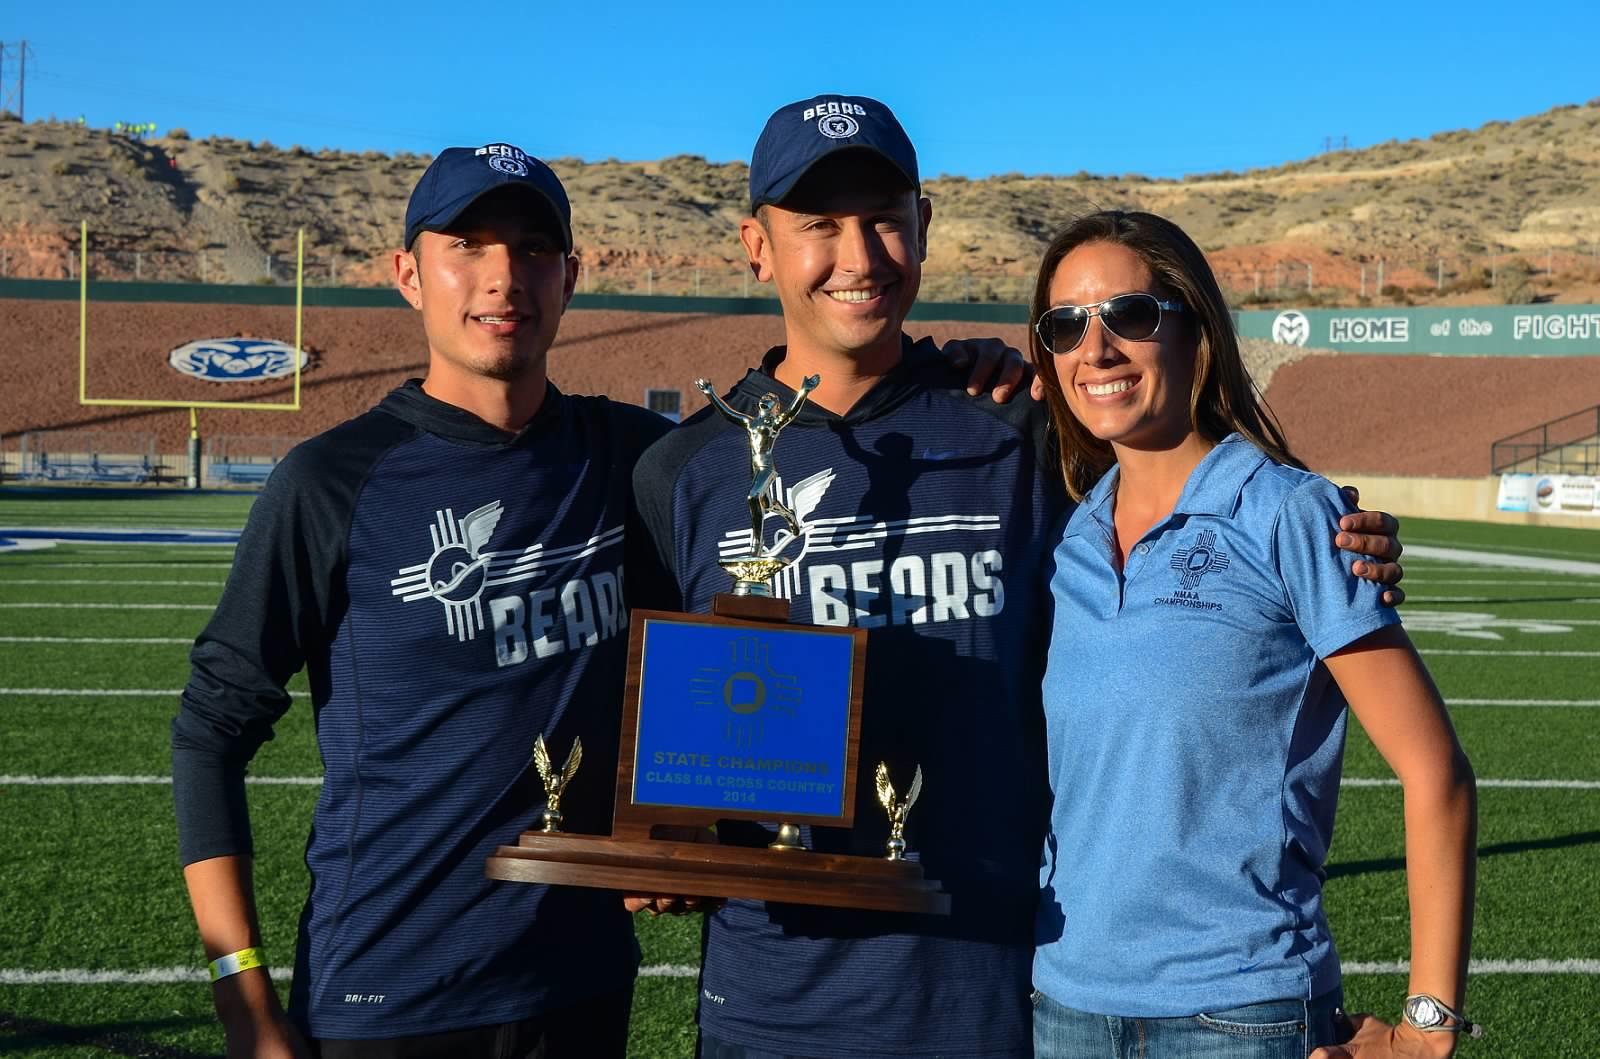 Matt Gallegos, Nick Martinez, Jackie Martinez - 2014 XC State Championships